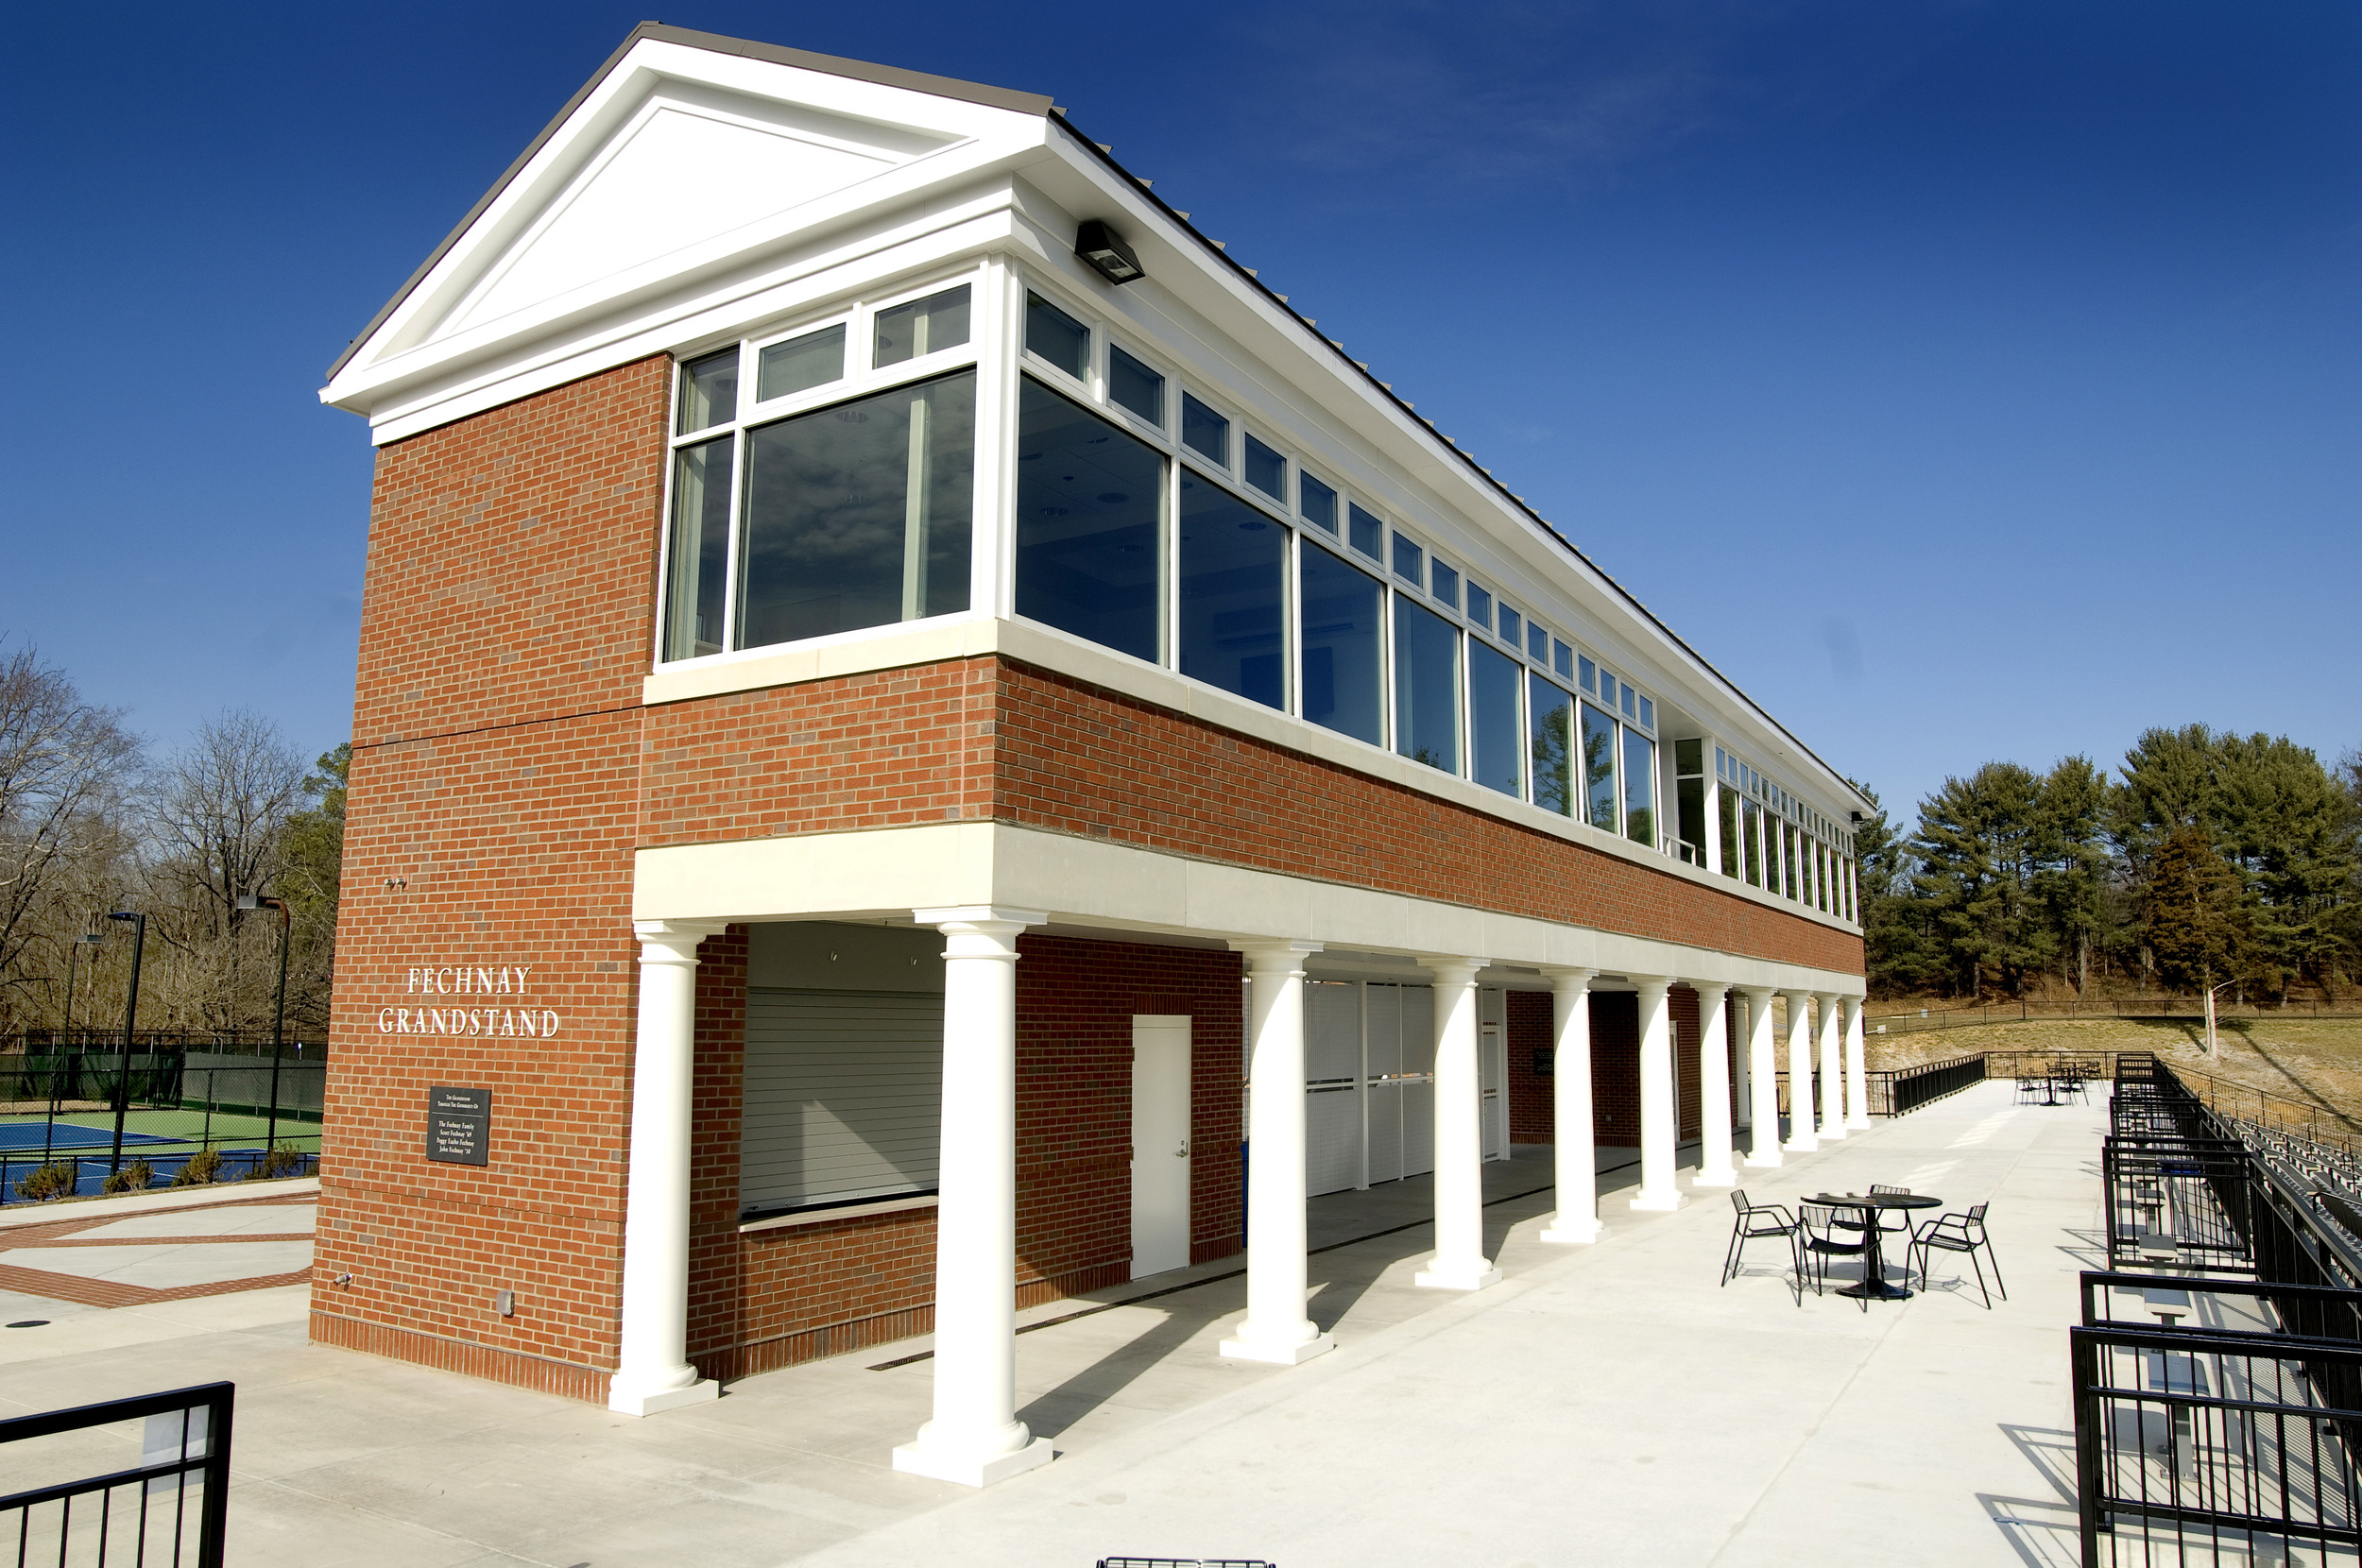 Washington & Lee University Fechnay Grandstand Exterior